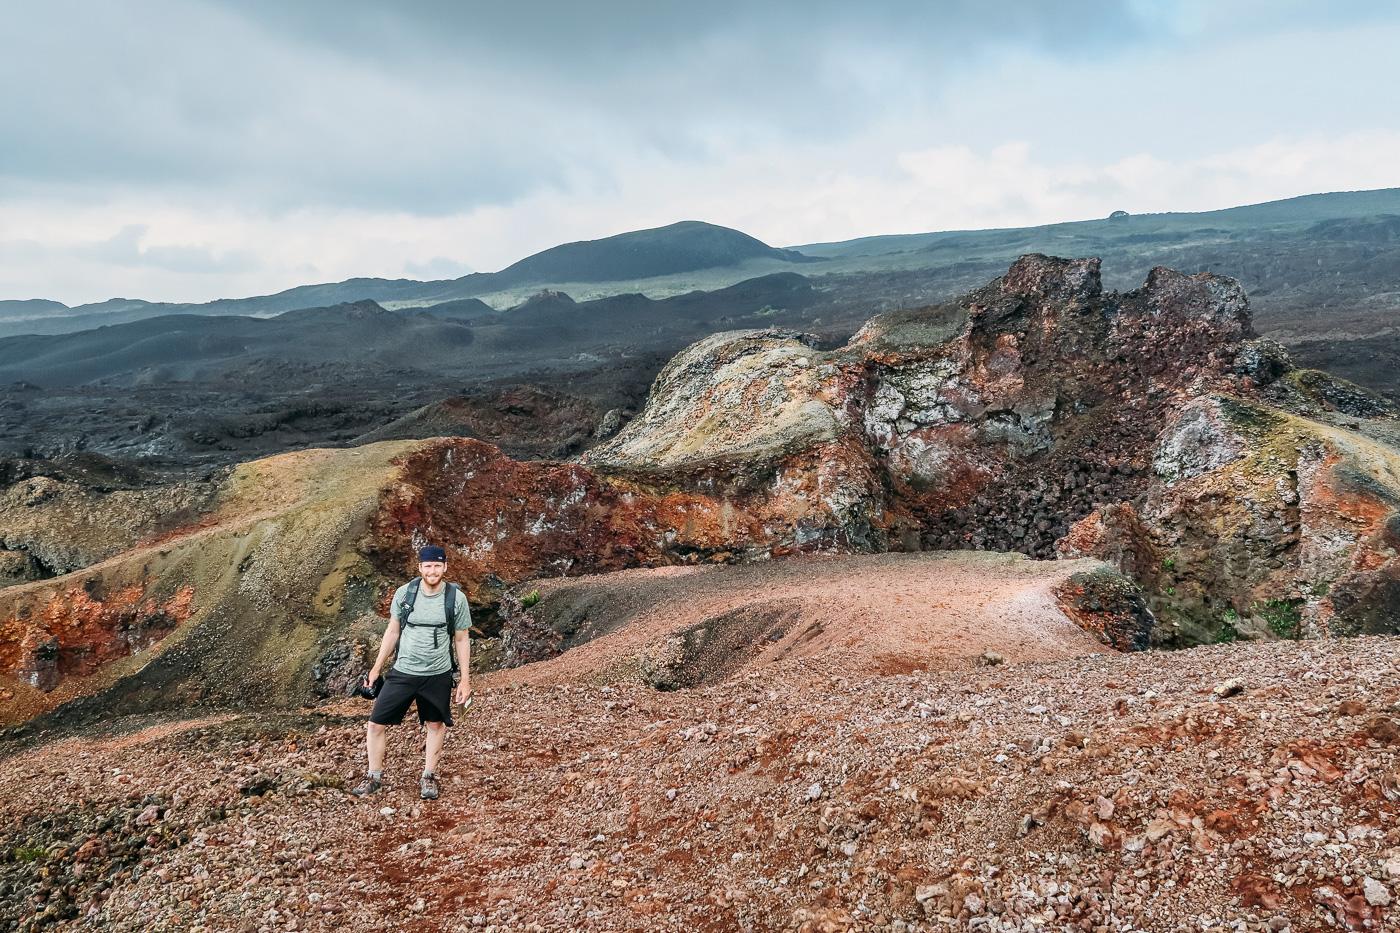 Galapagos - Sierra Negra Volcano (9 of 72) June 15